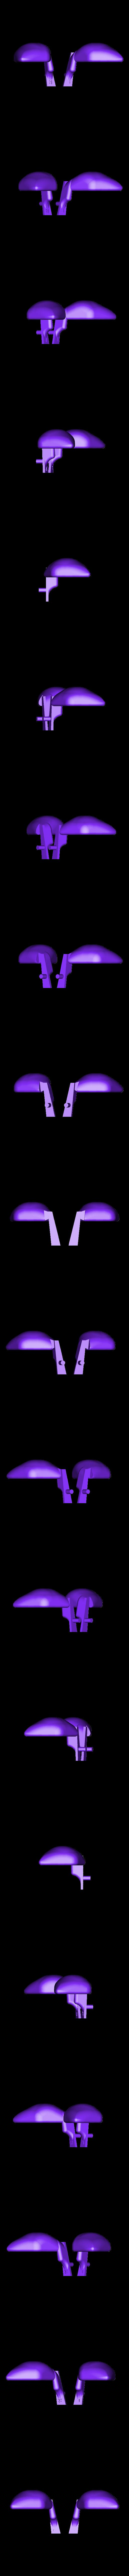 cat_tapa_COVID-19 v3.stl Download free STL file Covid-19 headband protector • 3D printing object, amilkarsp